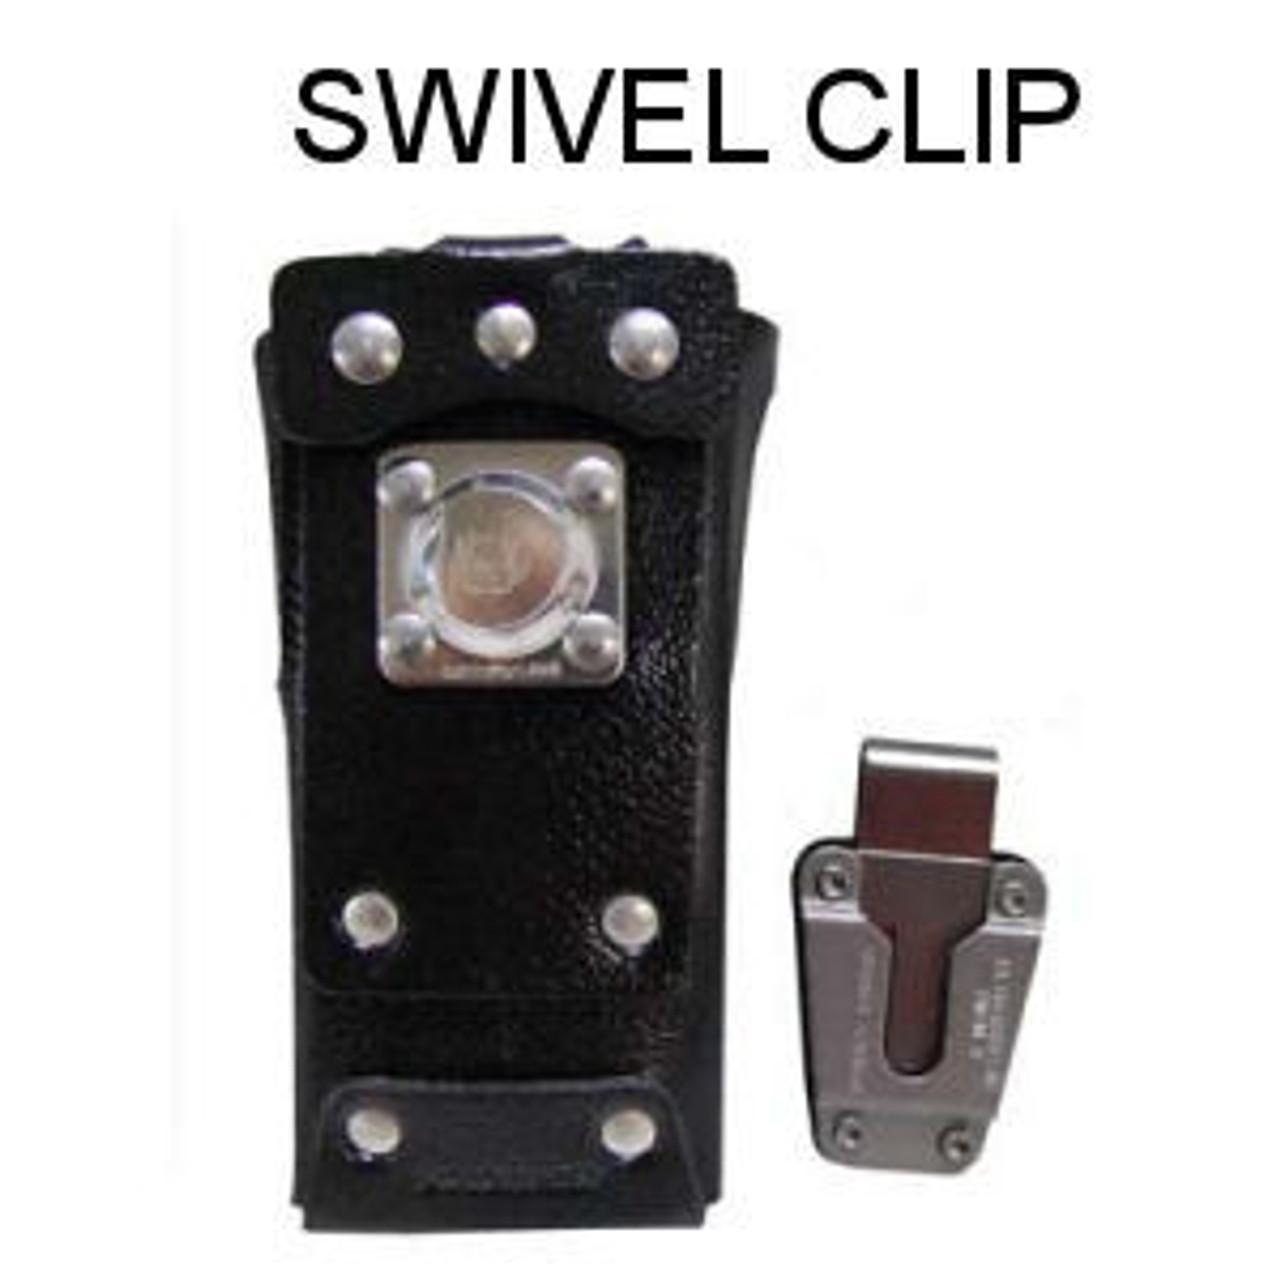 Motorola APX6000 Custom Radio Case With Swivel Clip